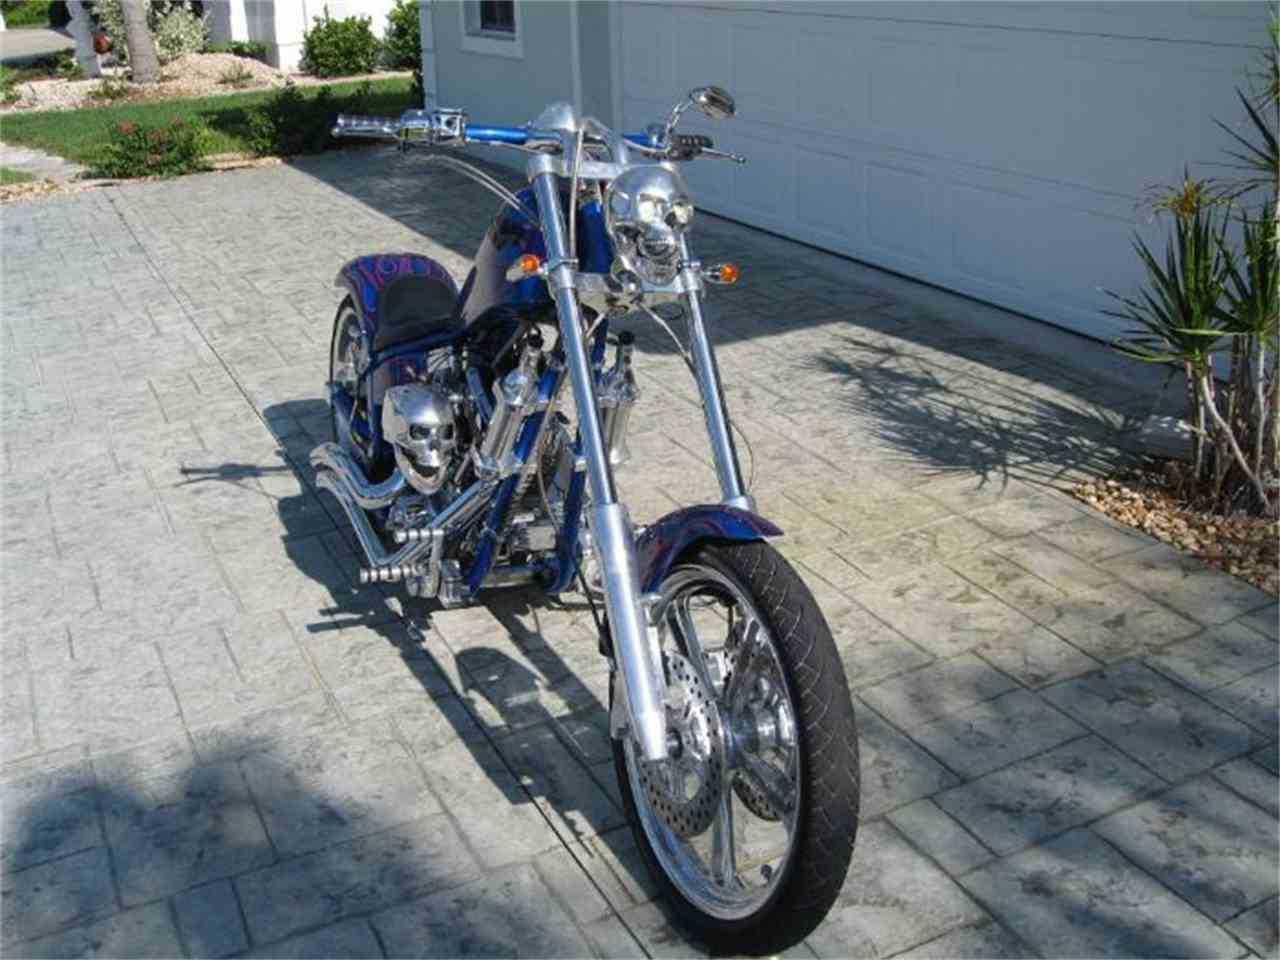 2002 American Ironhorse Texas Chopper for sale in Cadillac, MI |